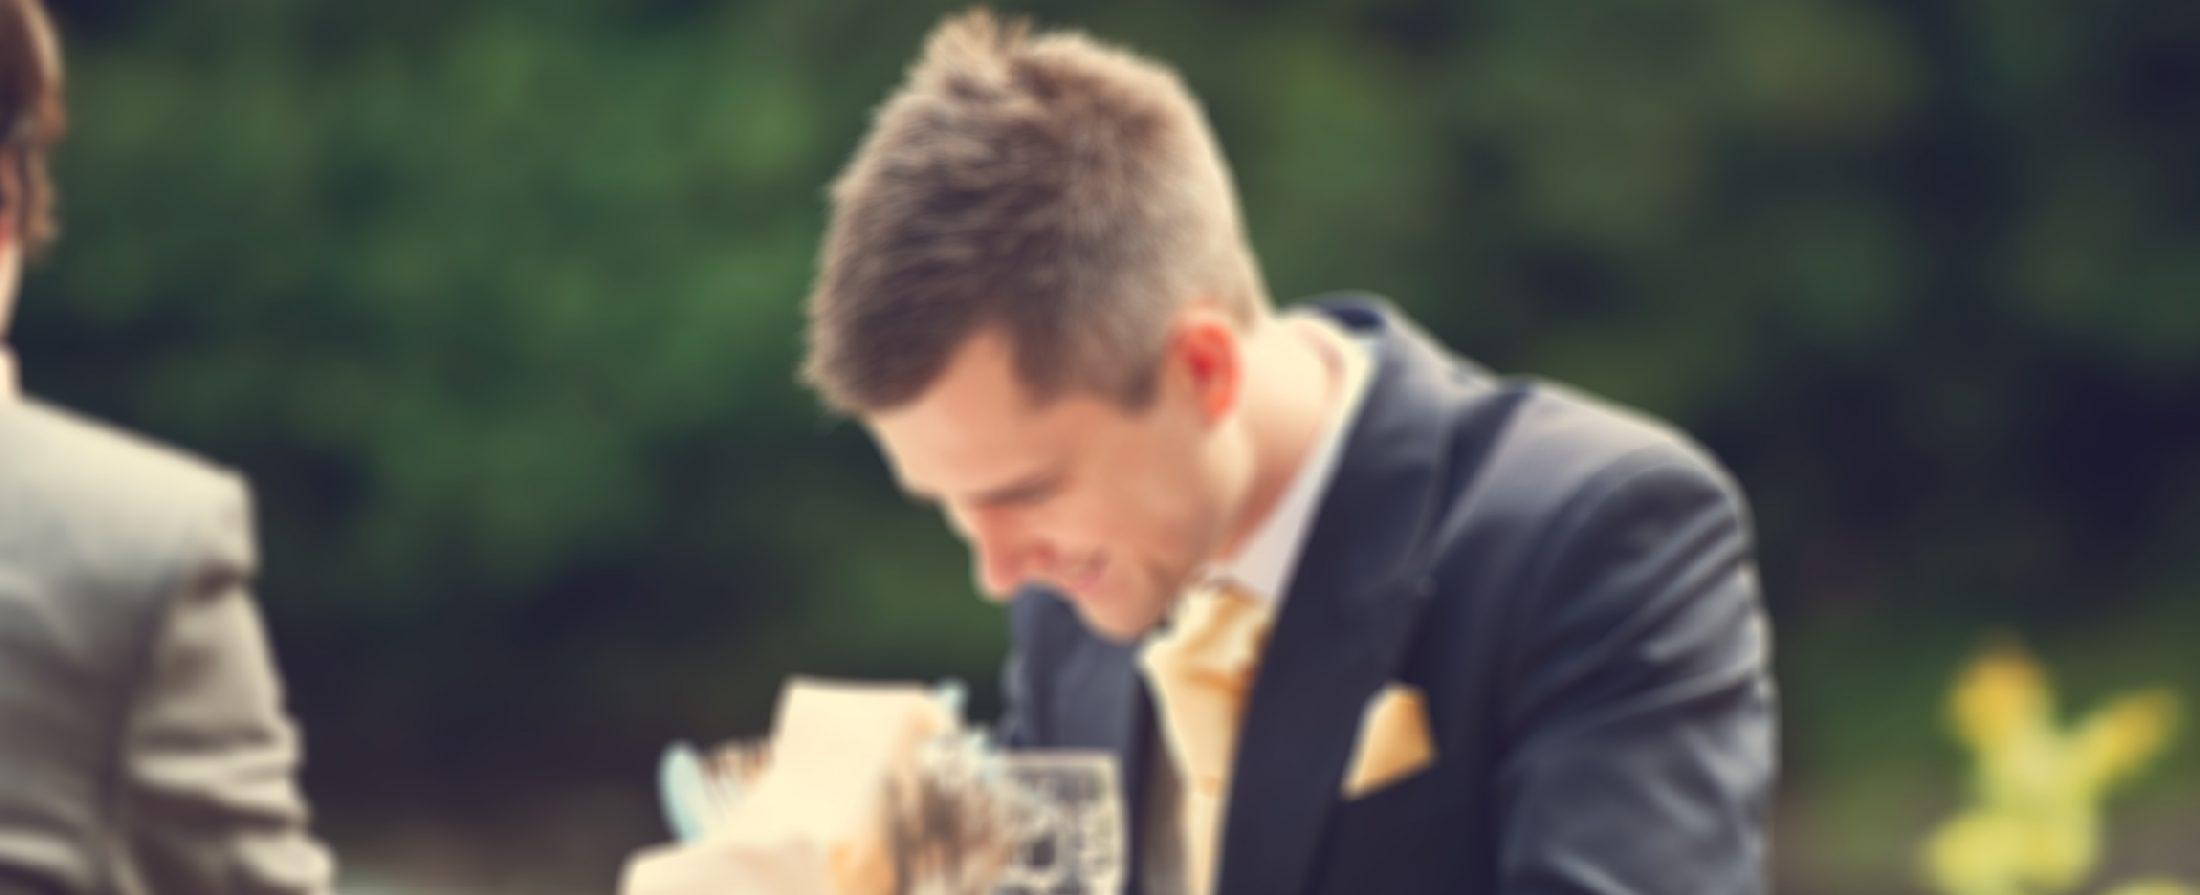 My Wedding Speech Tips